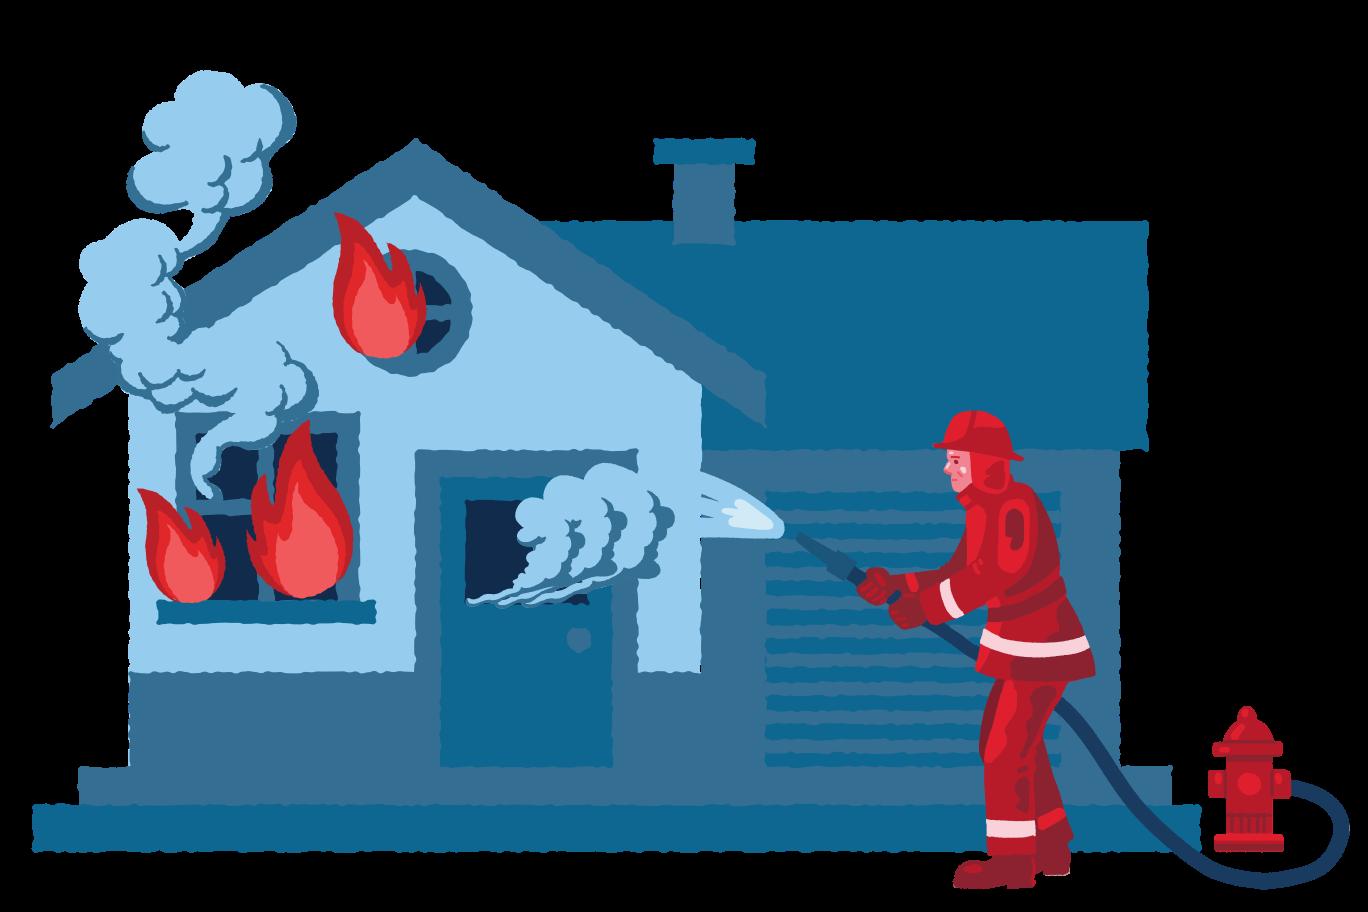 Firefighter Clipart illustration in PNG, SVG